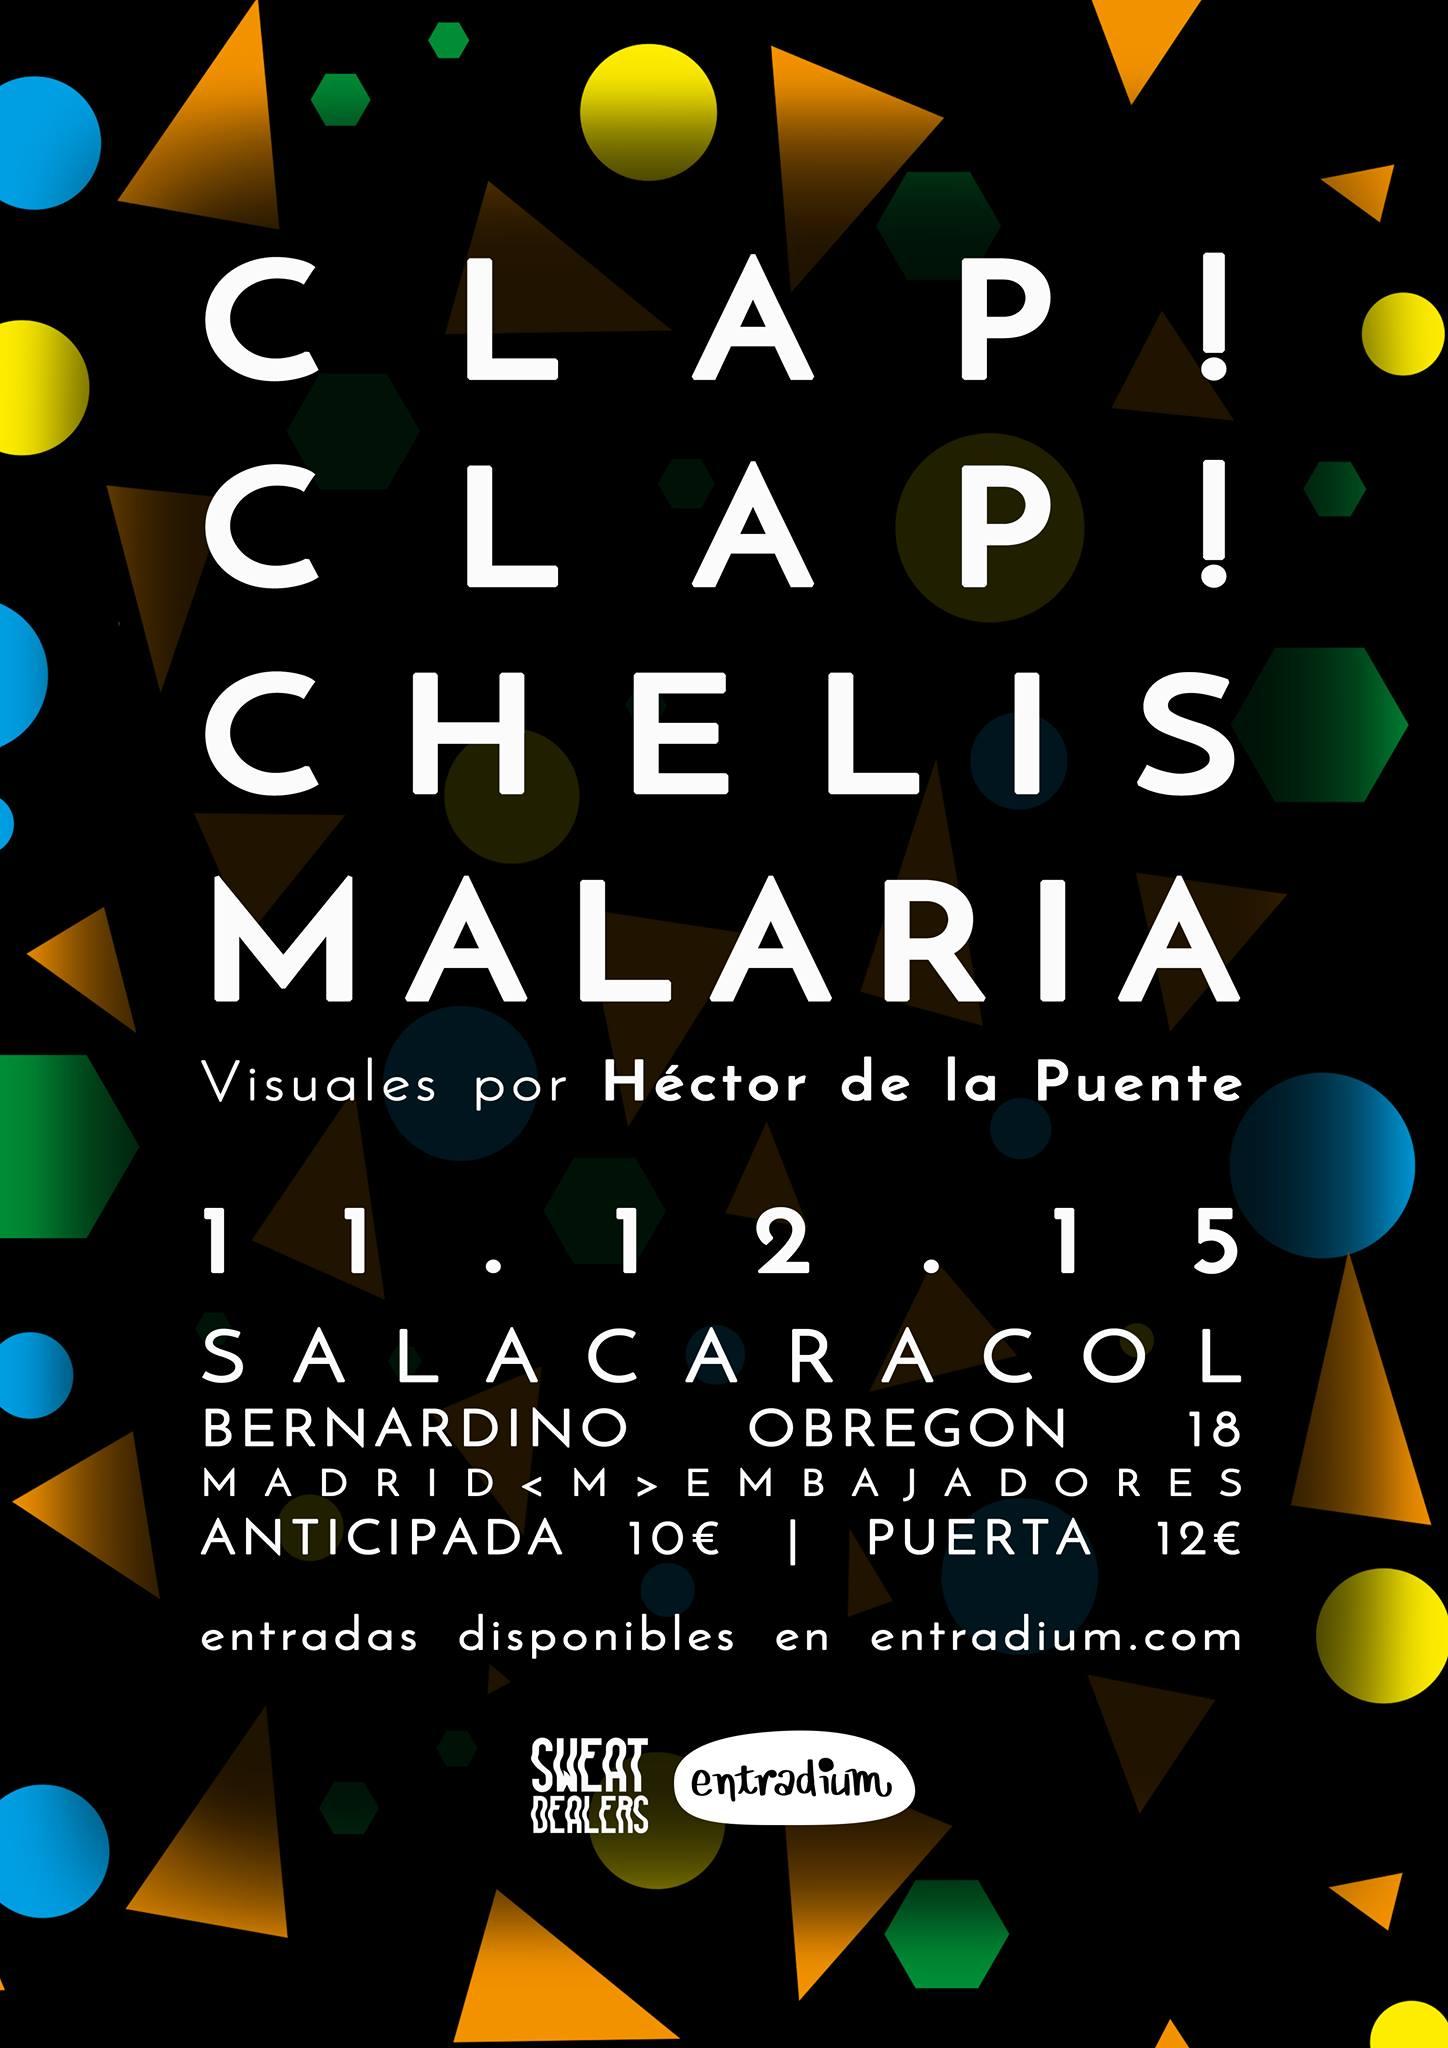 clap-clap-chelis-malaria-sala-caracol-madrid-2015